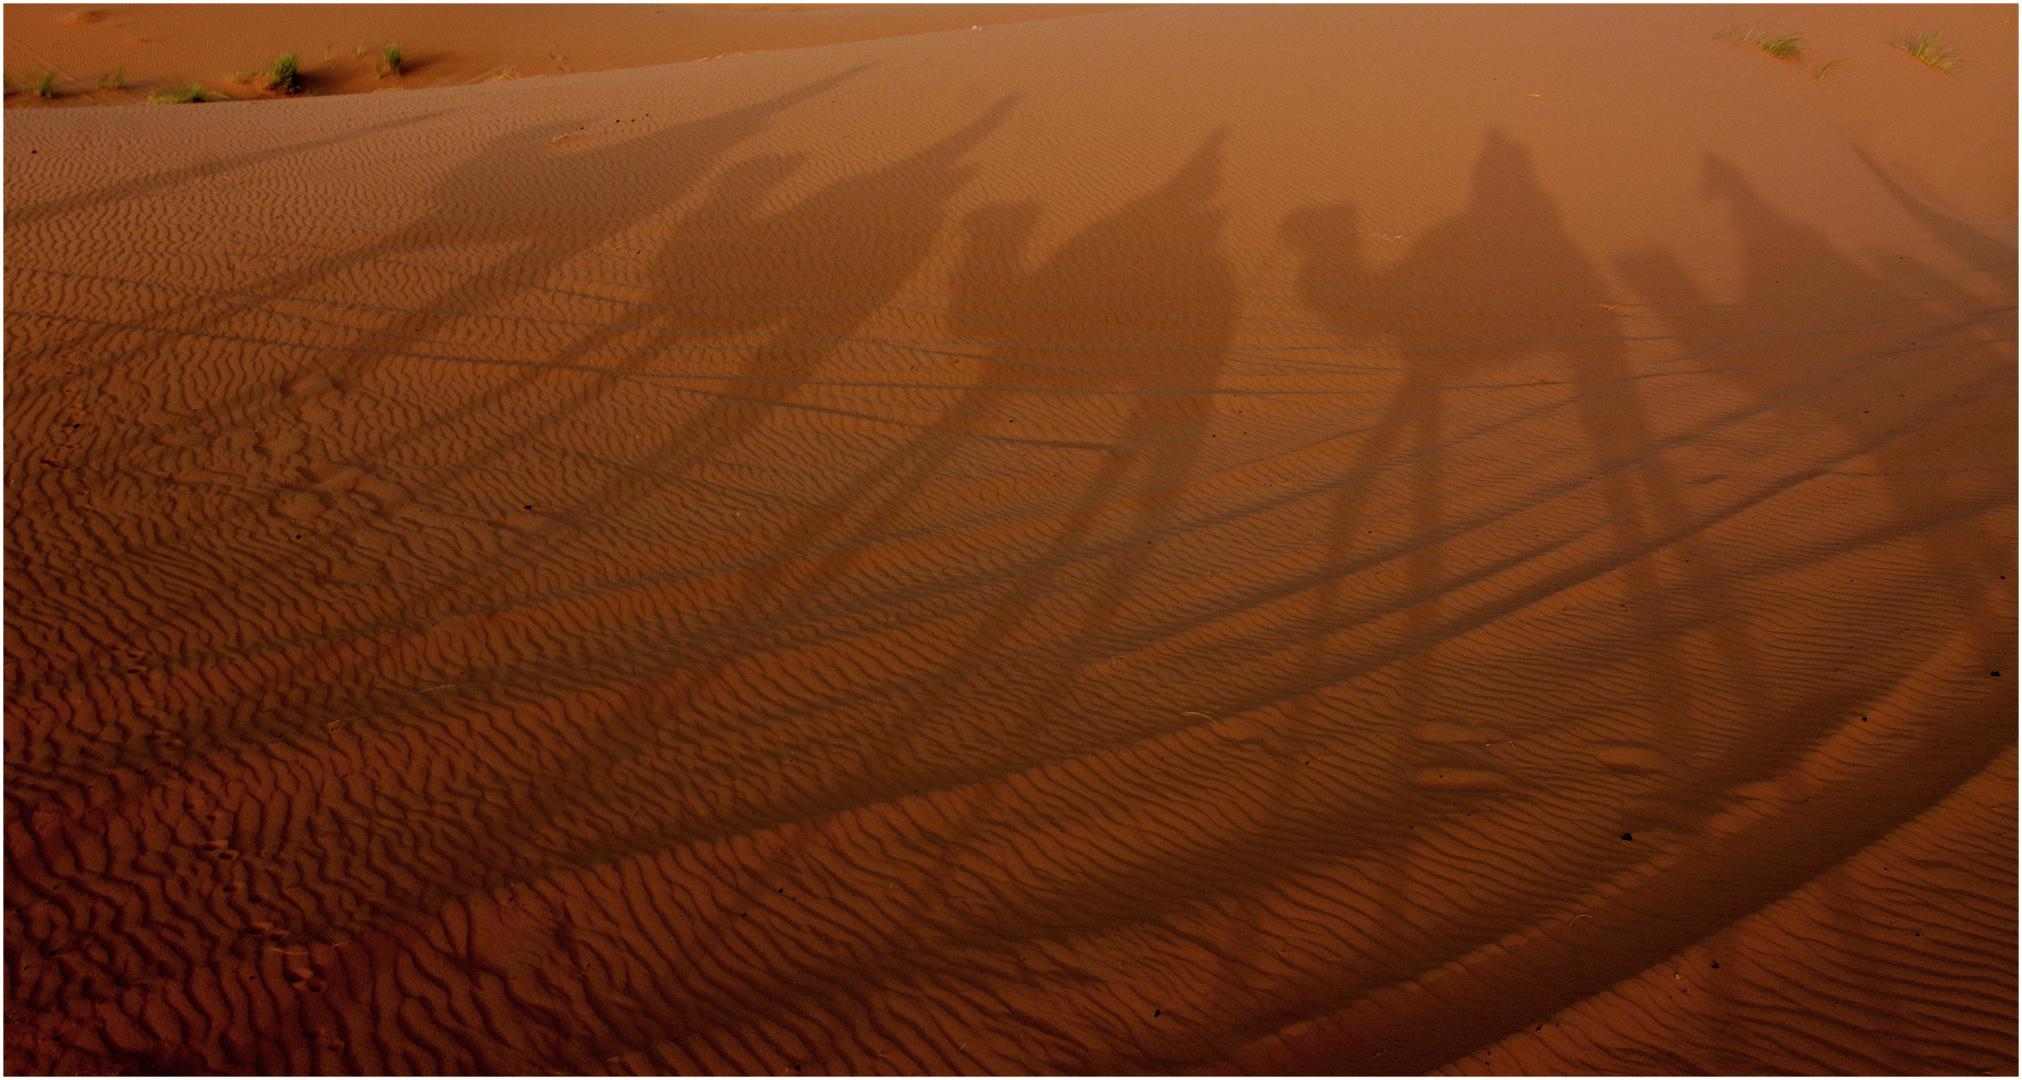 Reifenspuren im Sand ...